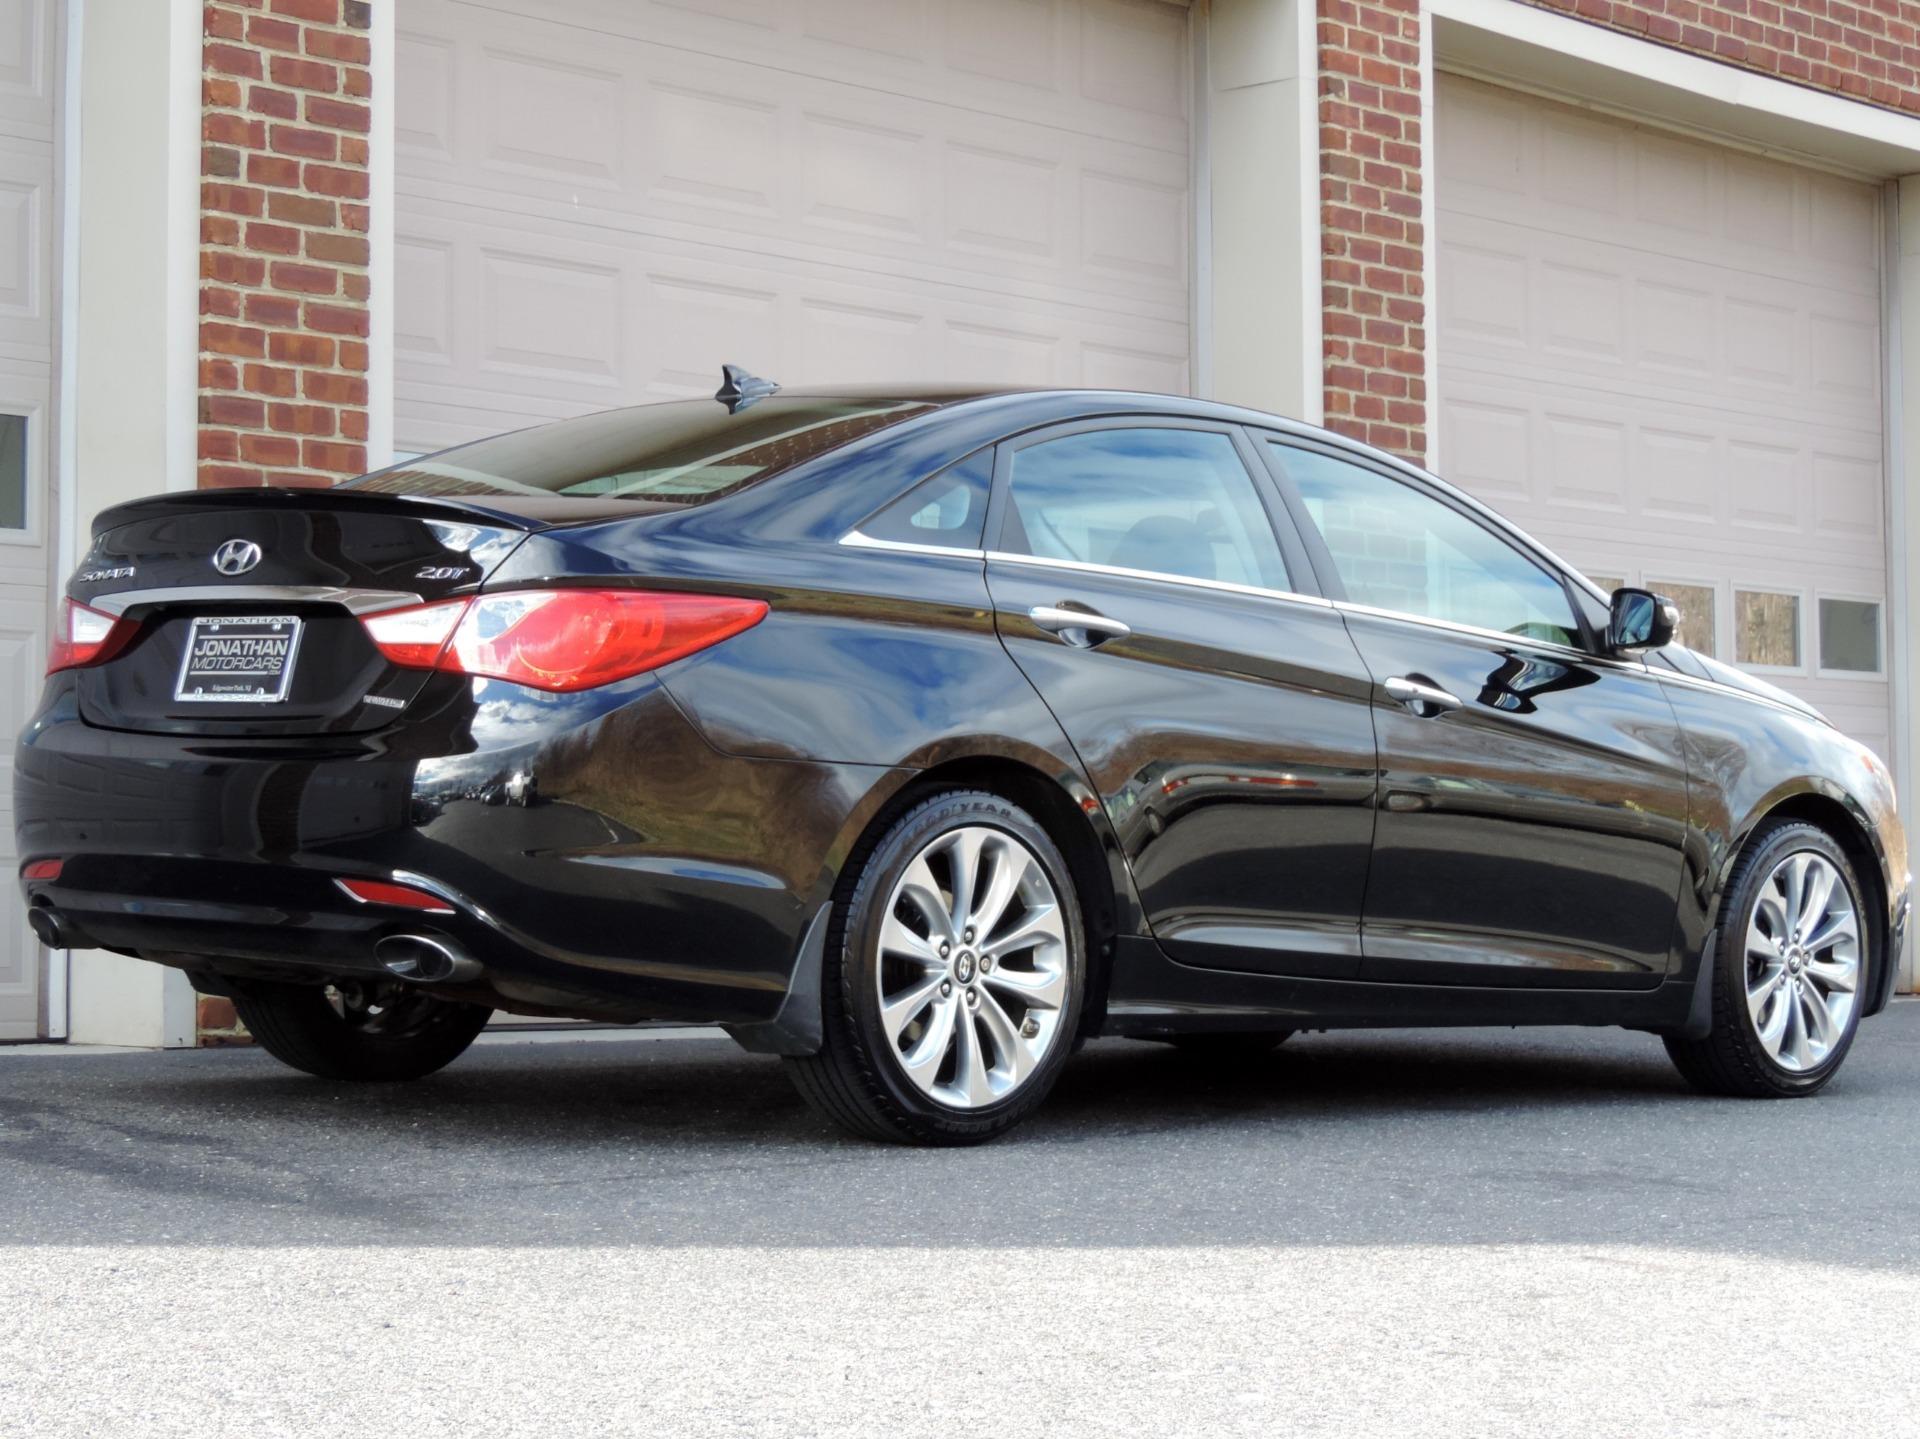 Used-2013-Hyundai-Sonata-Limited-20T